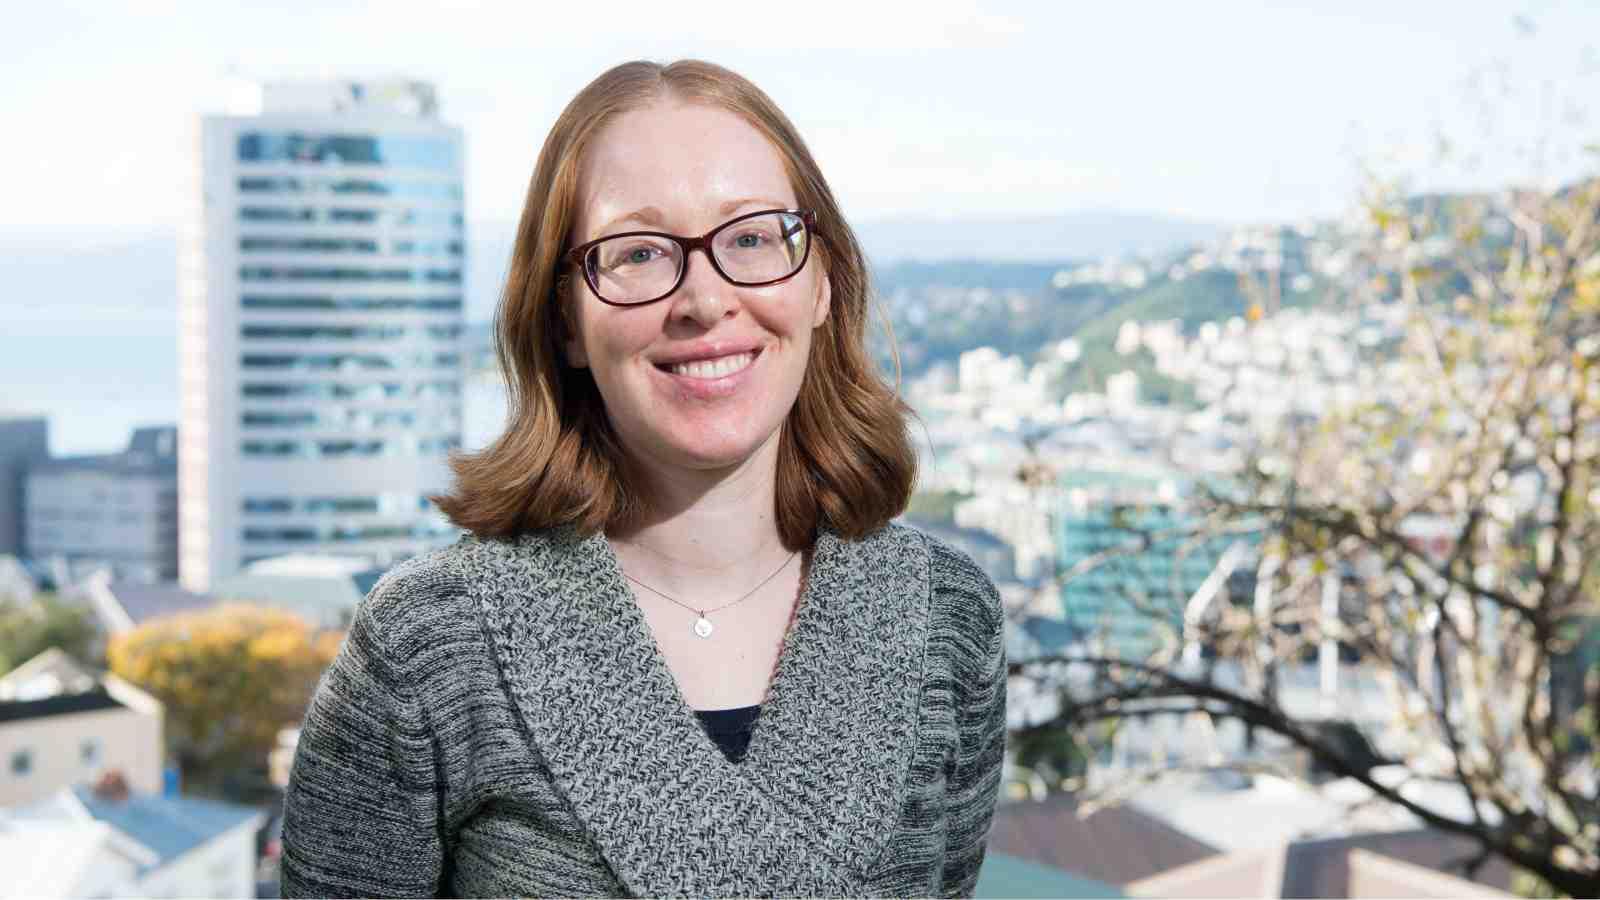 PhD candidate Hazel Godfrey